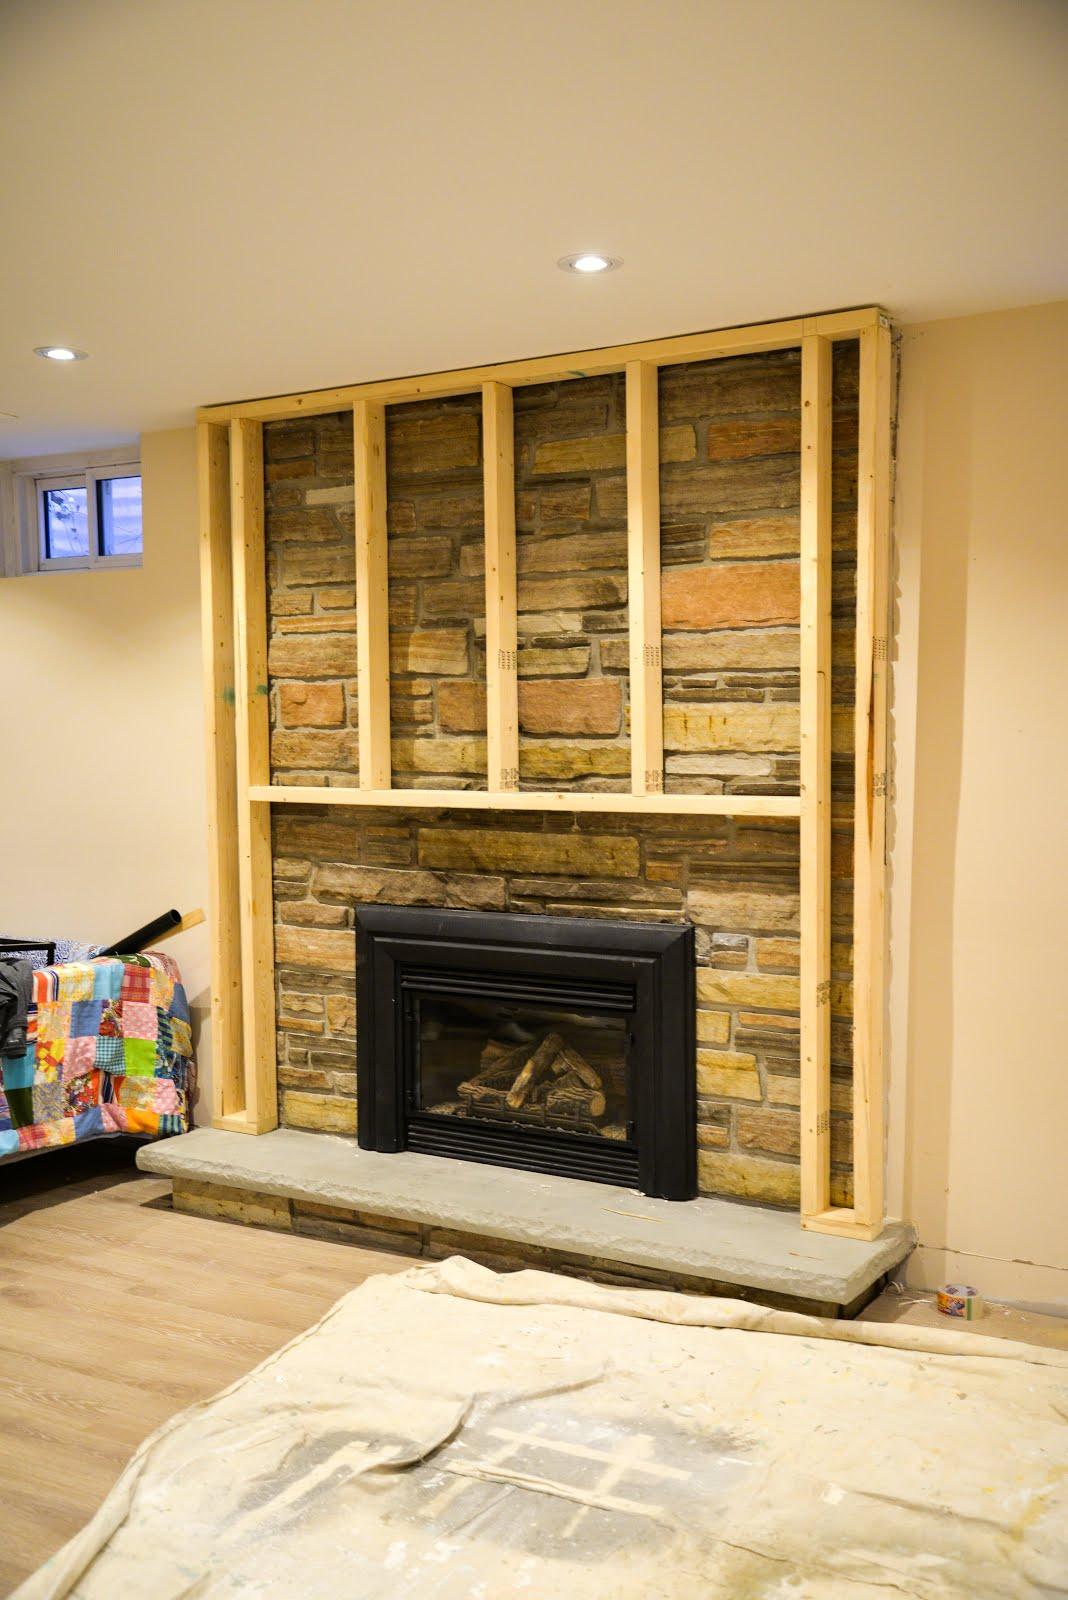 One Room Challenge Week 3: Framing Around An Old Fireplace - Rambling Renovators